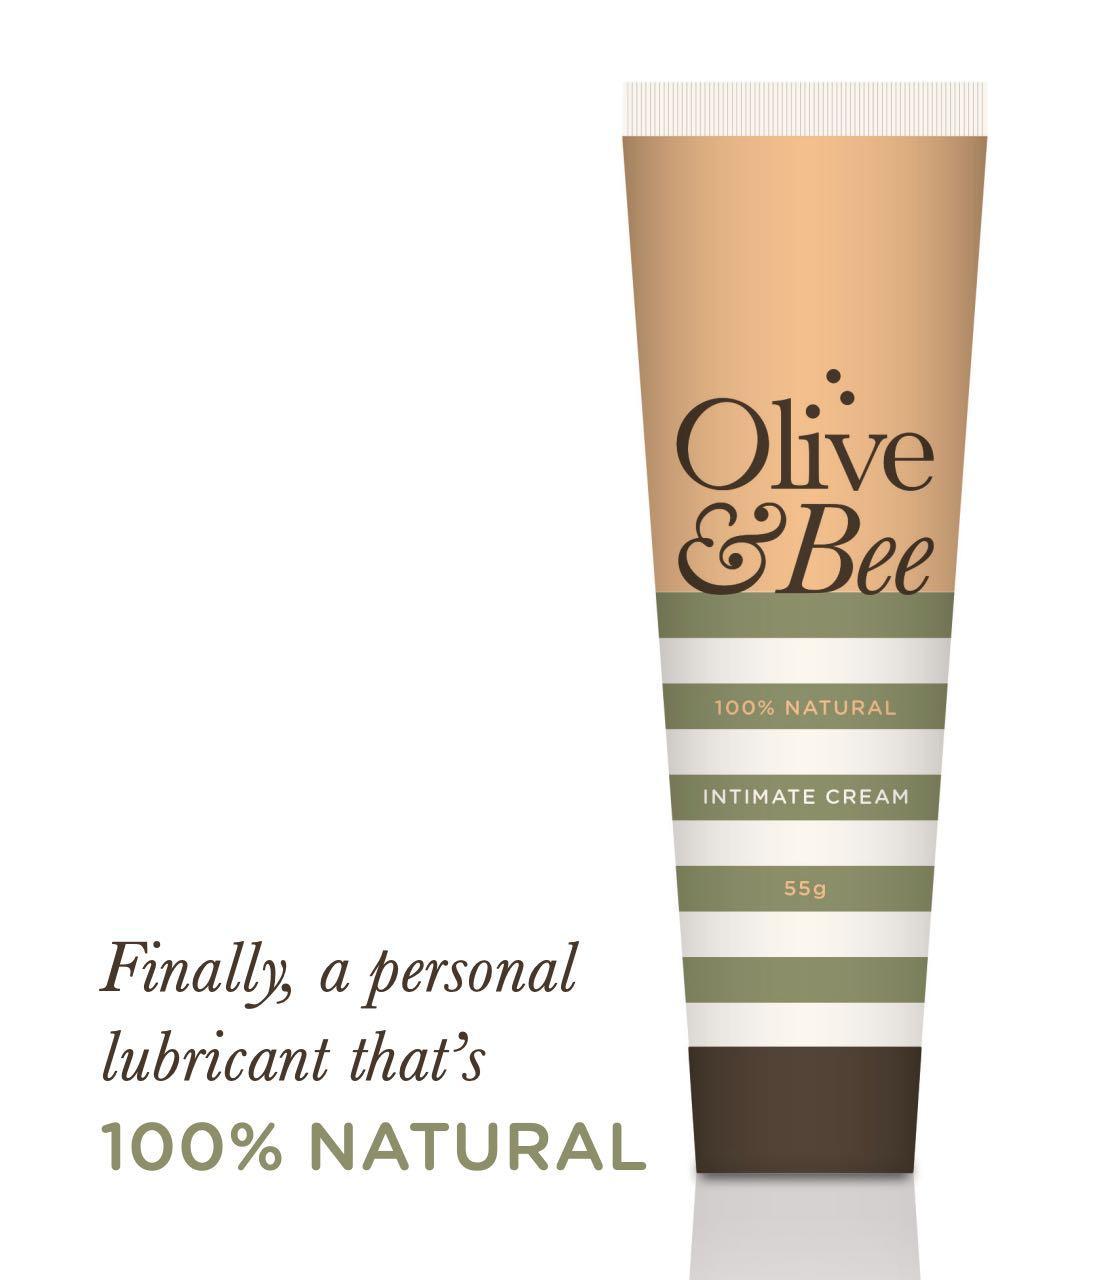 Olive & Bee 澳洲天然滋潤親密霜 Intimate Cream ?舒緩陰道乾澀問題 ?陰部保濕及提供滋潤營養 ?緩解因衛生 ...